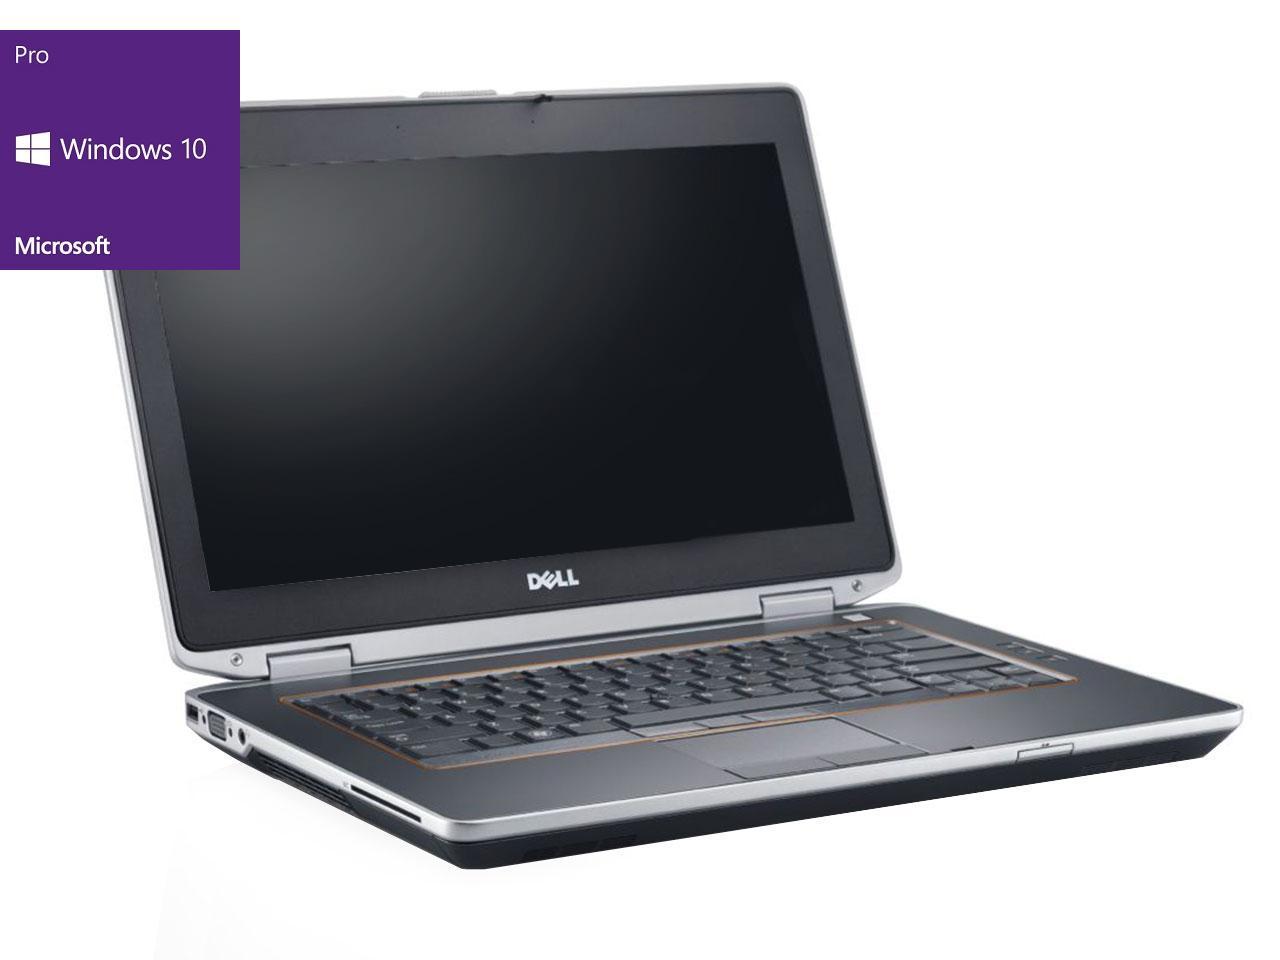 Dell Latitude E6420  - shop.bb-net.de